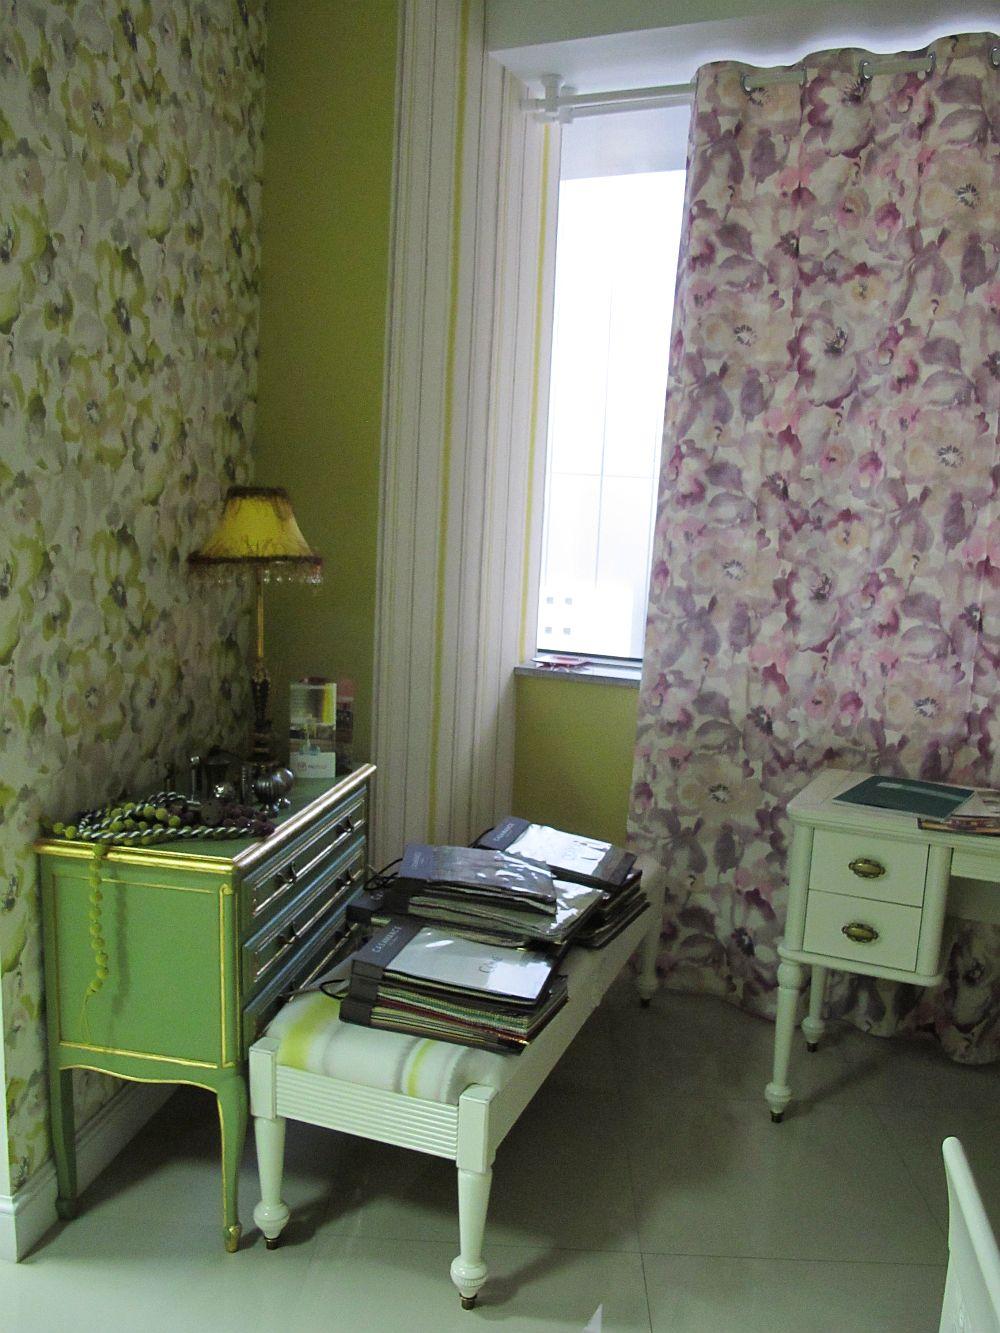 adelaparvu.com despre decoratiuni ProPlus, tapete, perdele, draperii, corpuri iluminat, oglinzi, mobila, parchet (11)